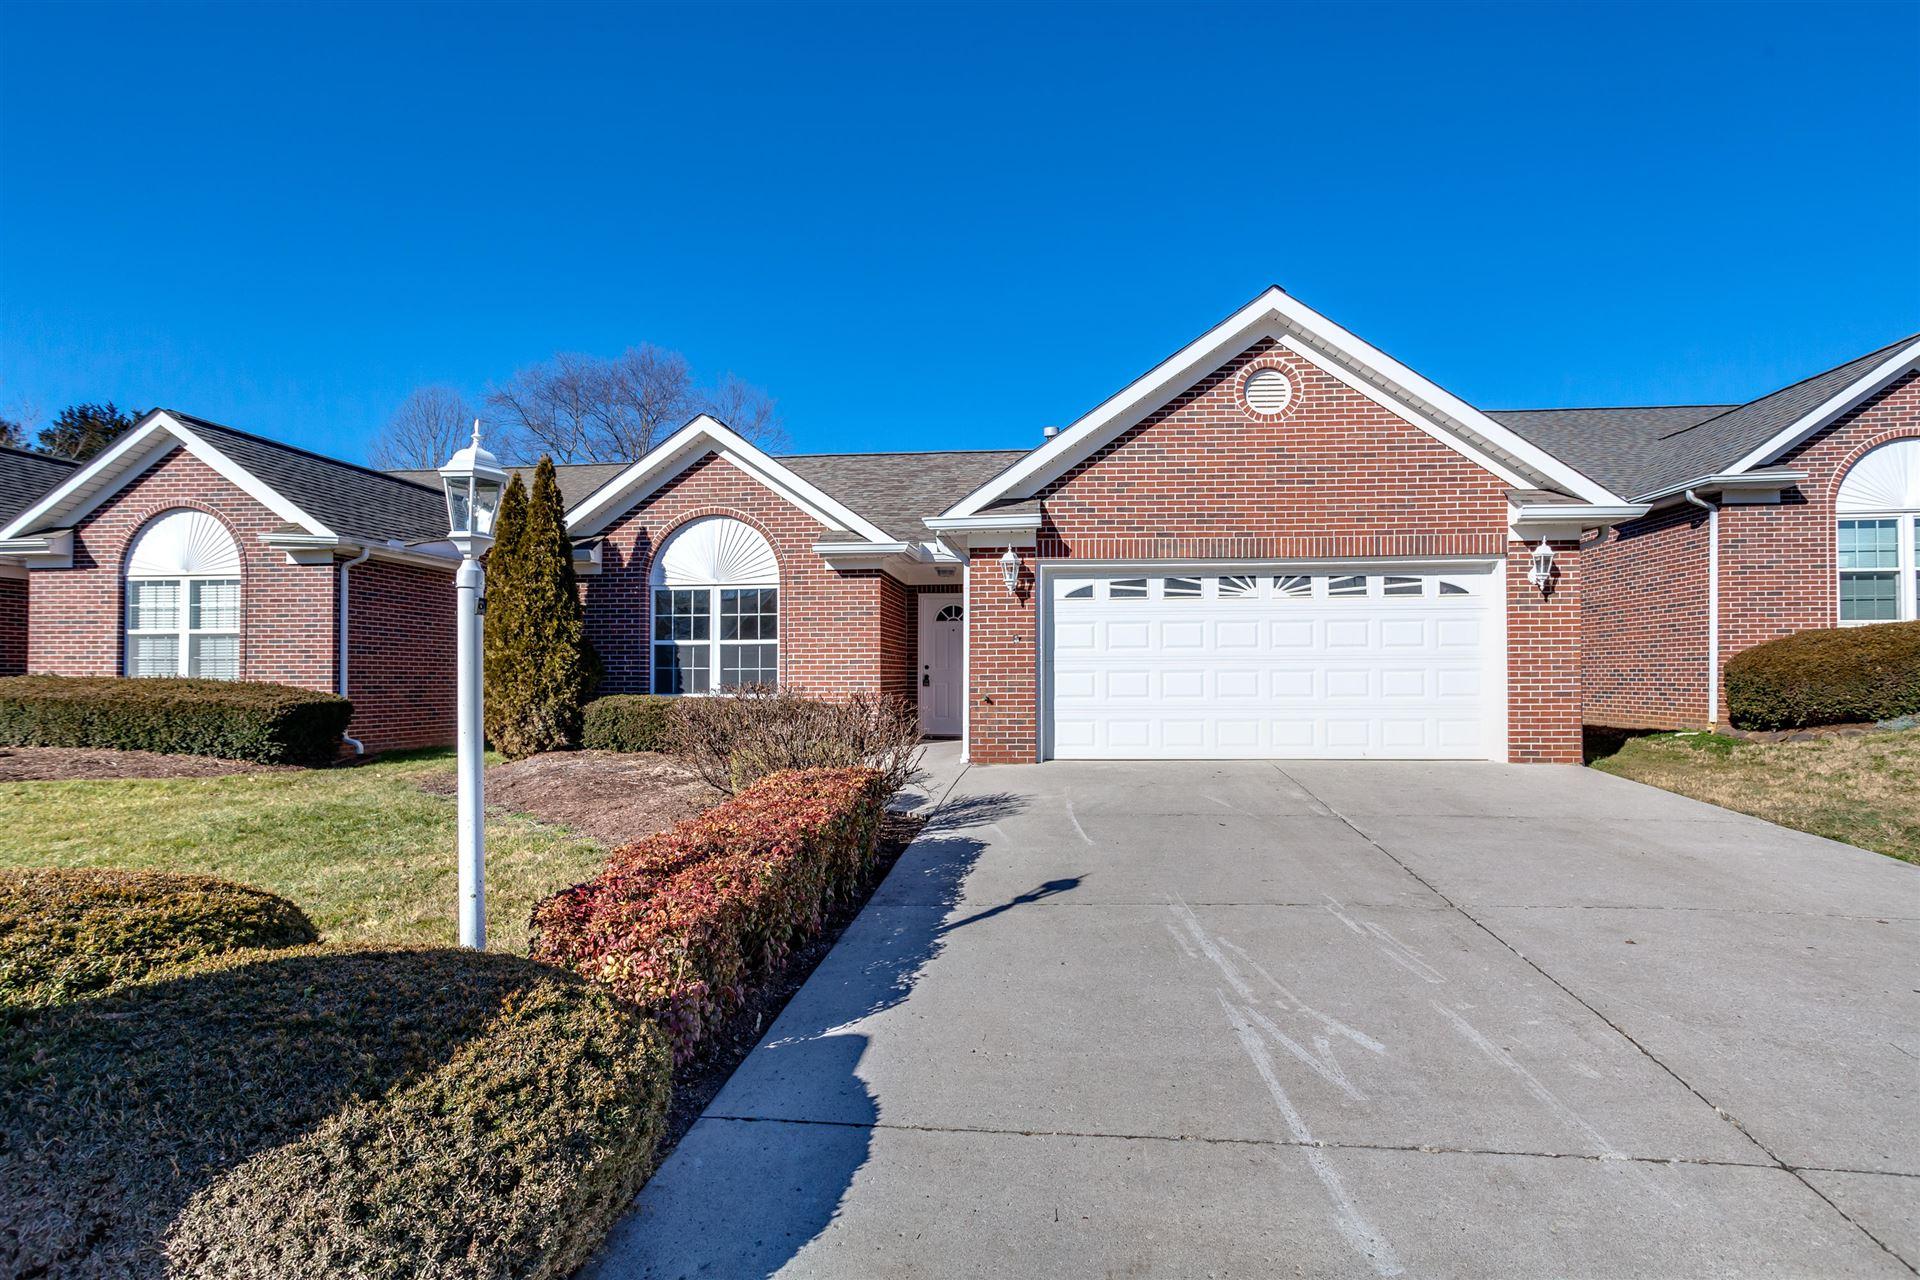 Photo of 4407 Hartland Lane, Knoxville, TN 37938 (MLS # 1140922)